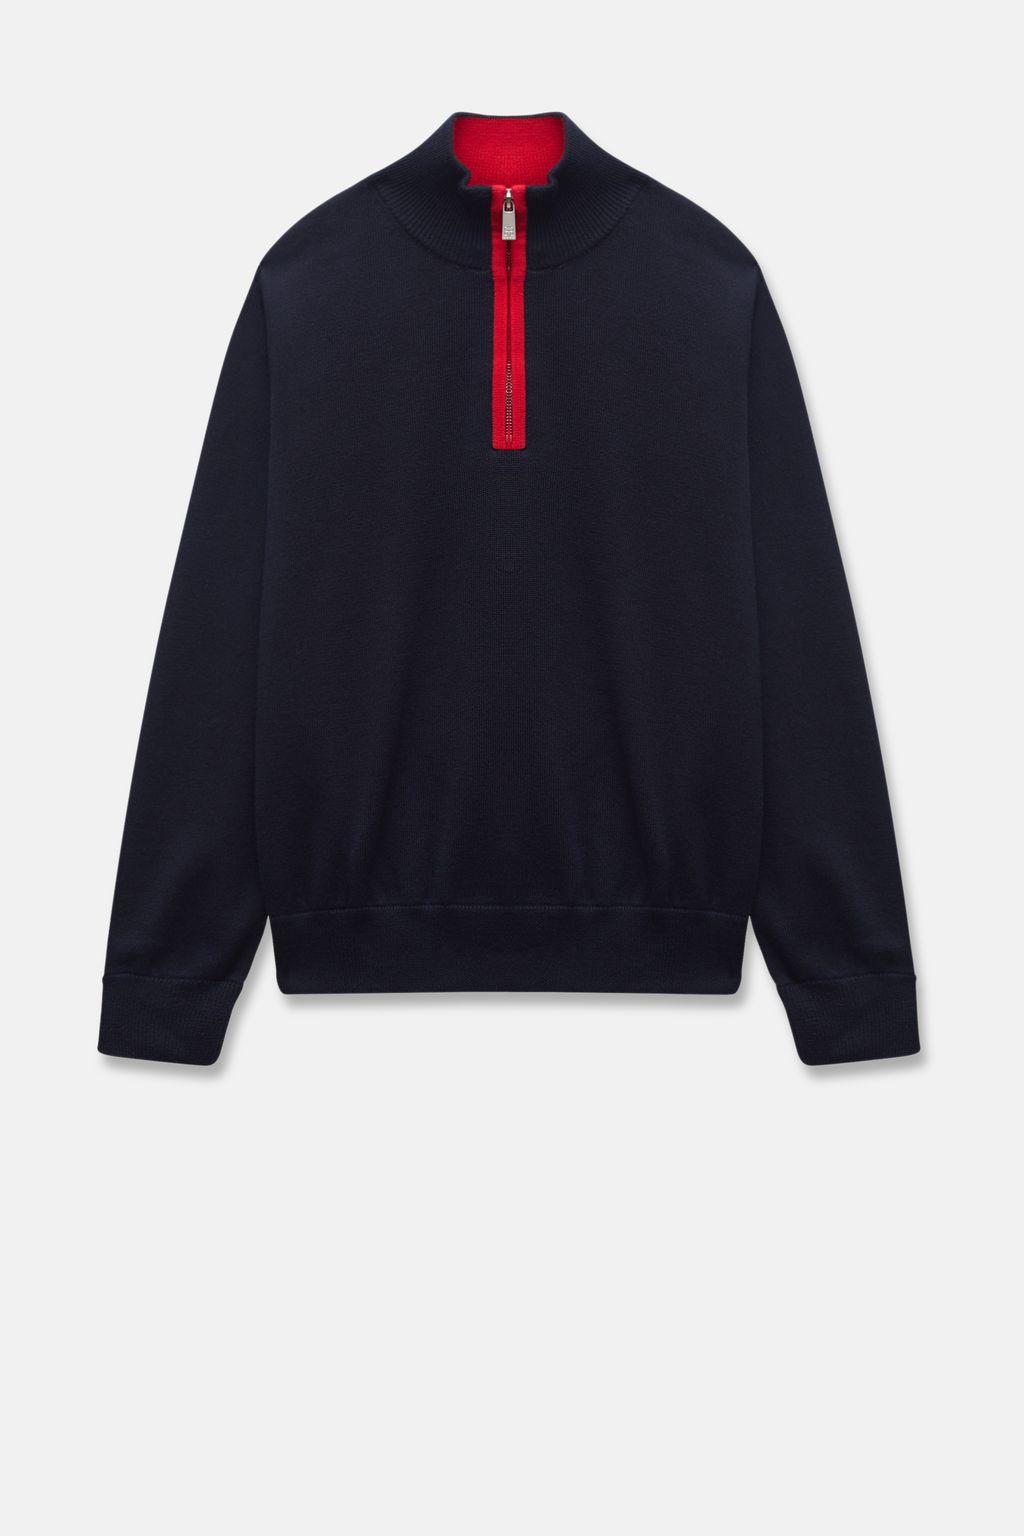 CH Swing half-zip sweater